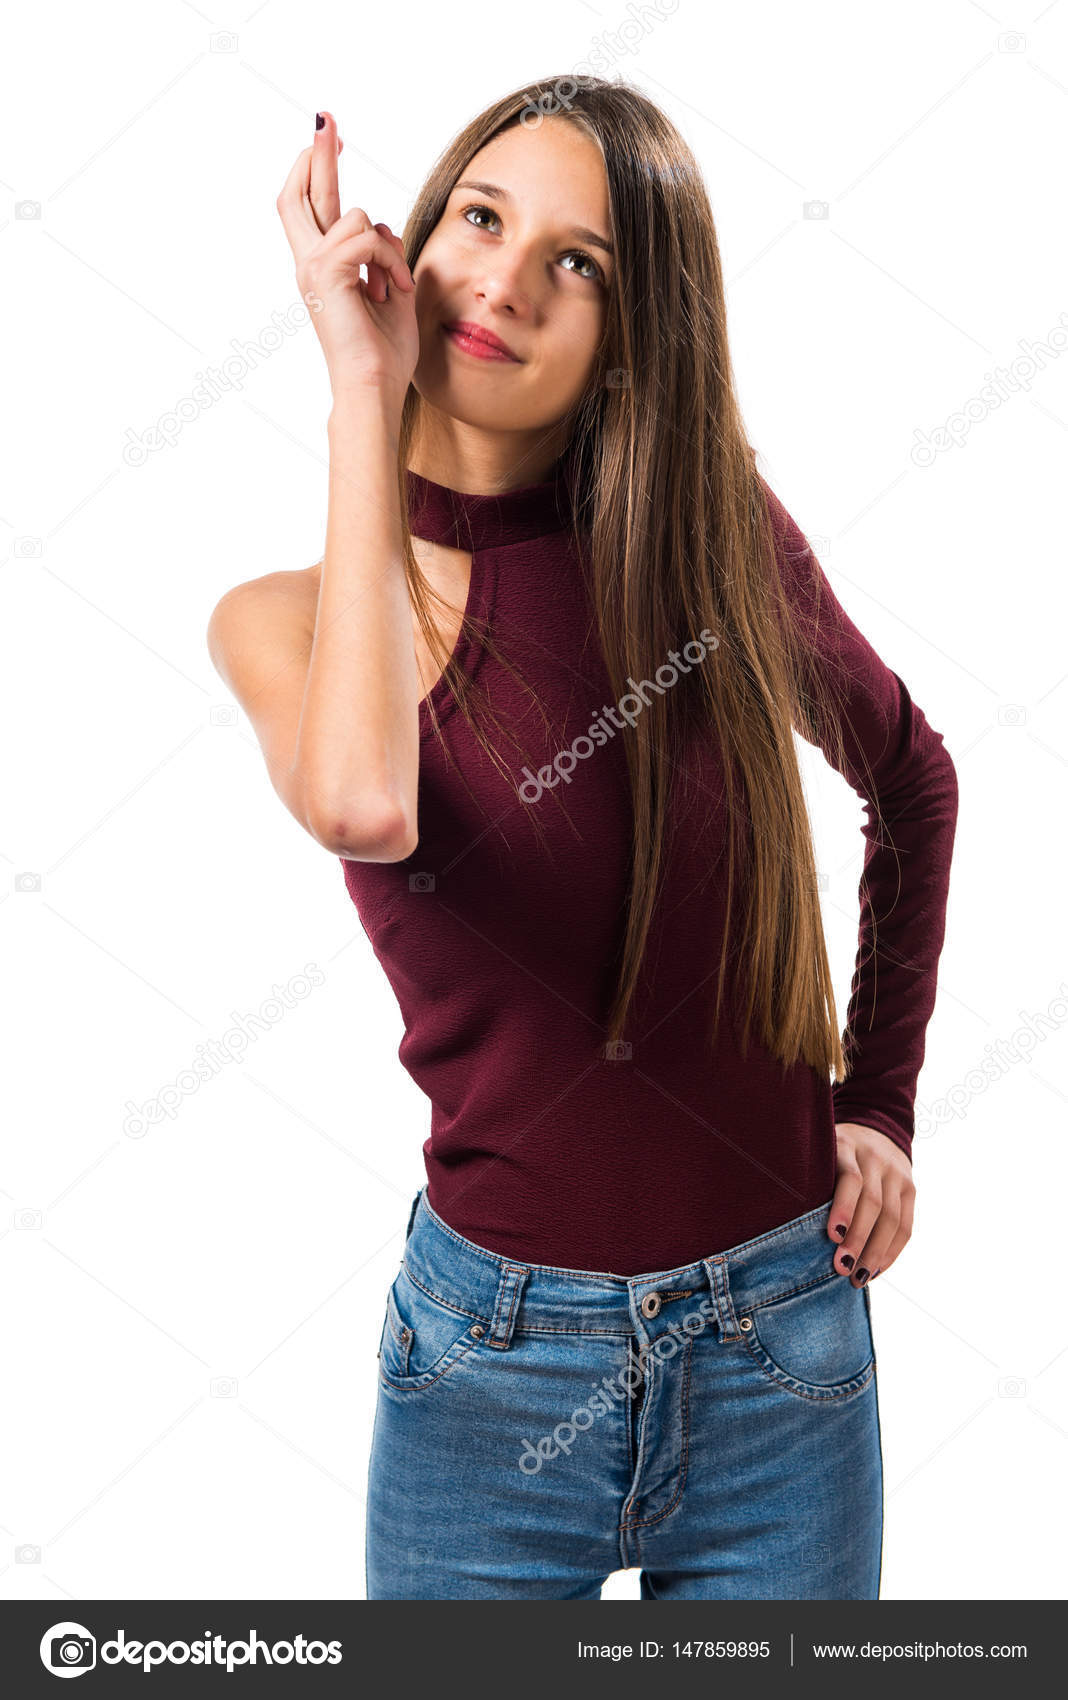 Porn of jessica alba